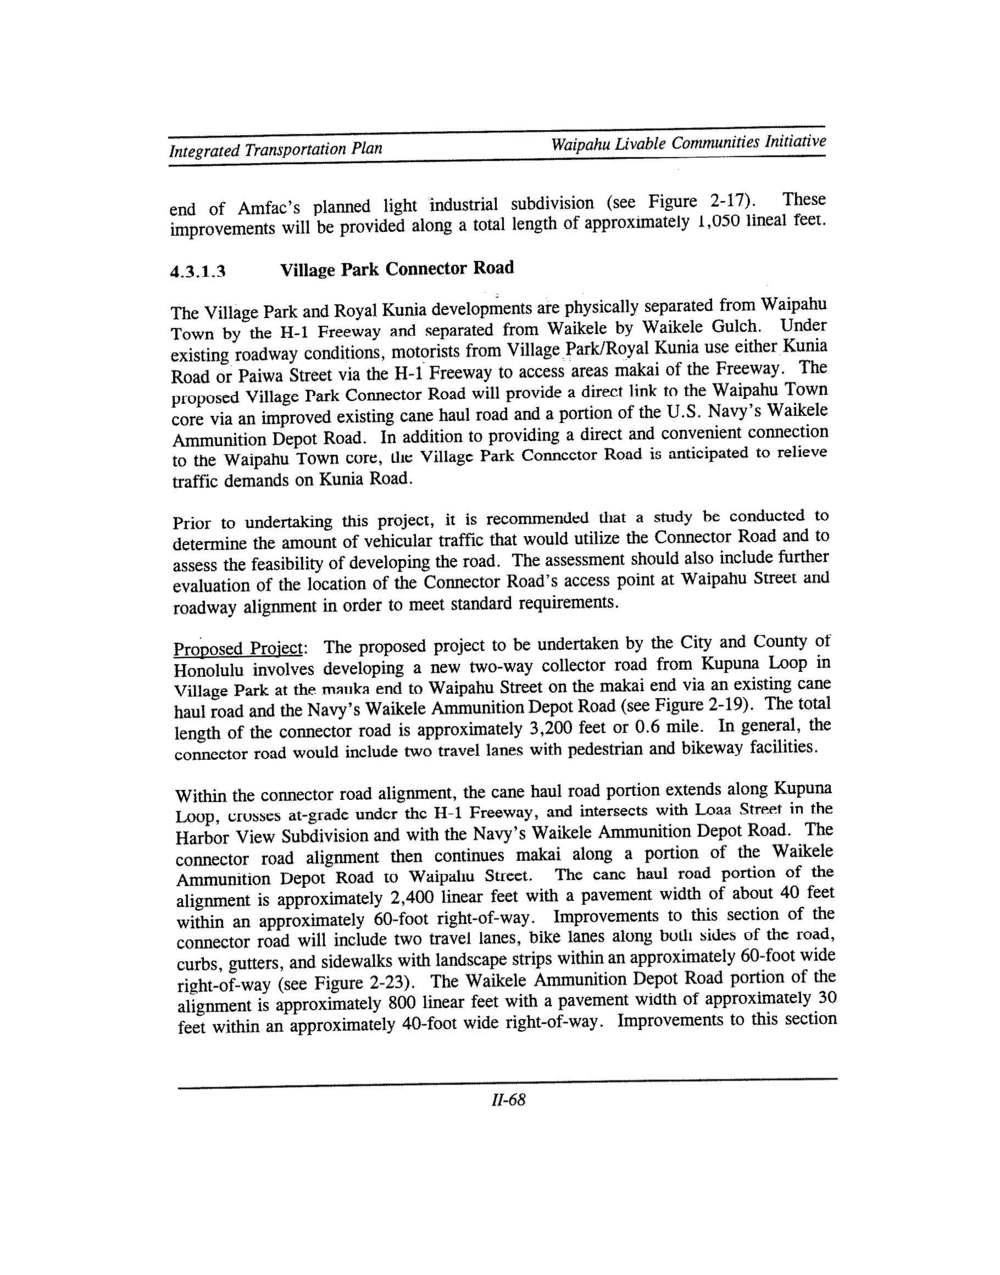 160531_WaipahuLivableCommunities(1998)_Page_083.jpg